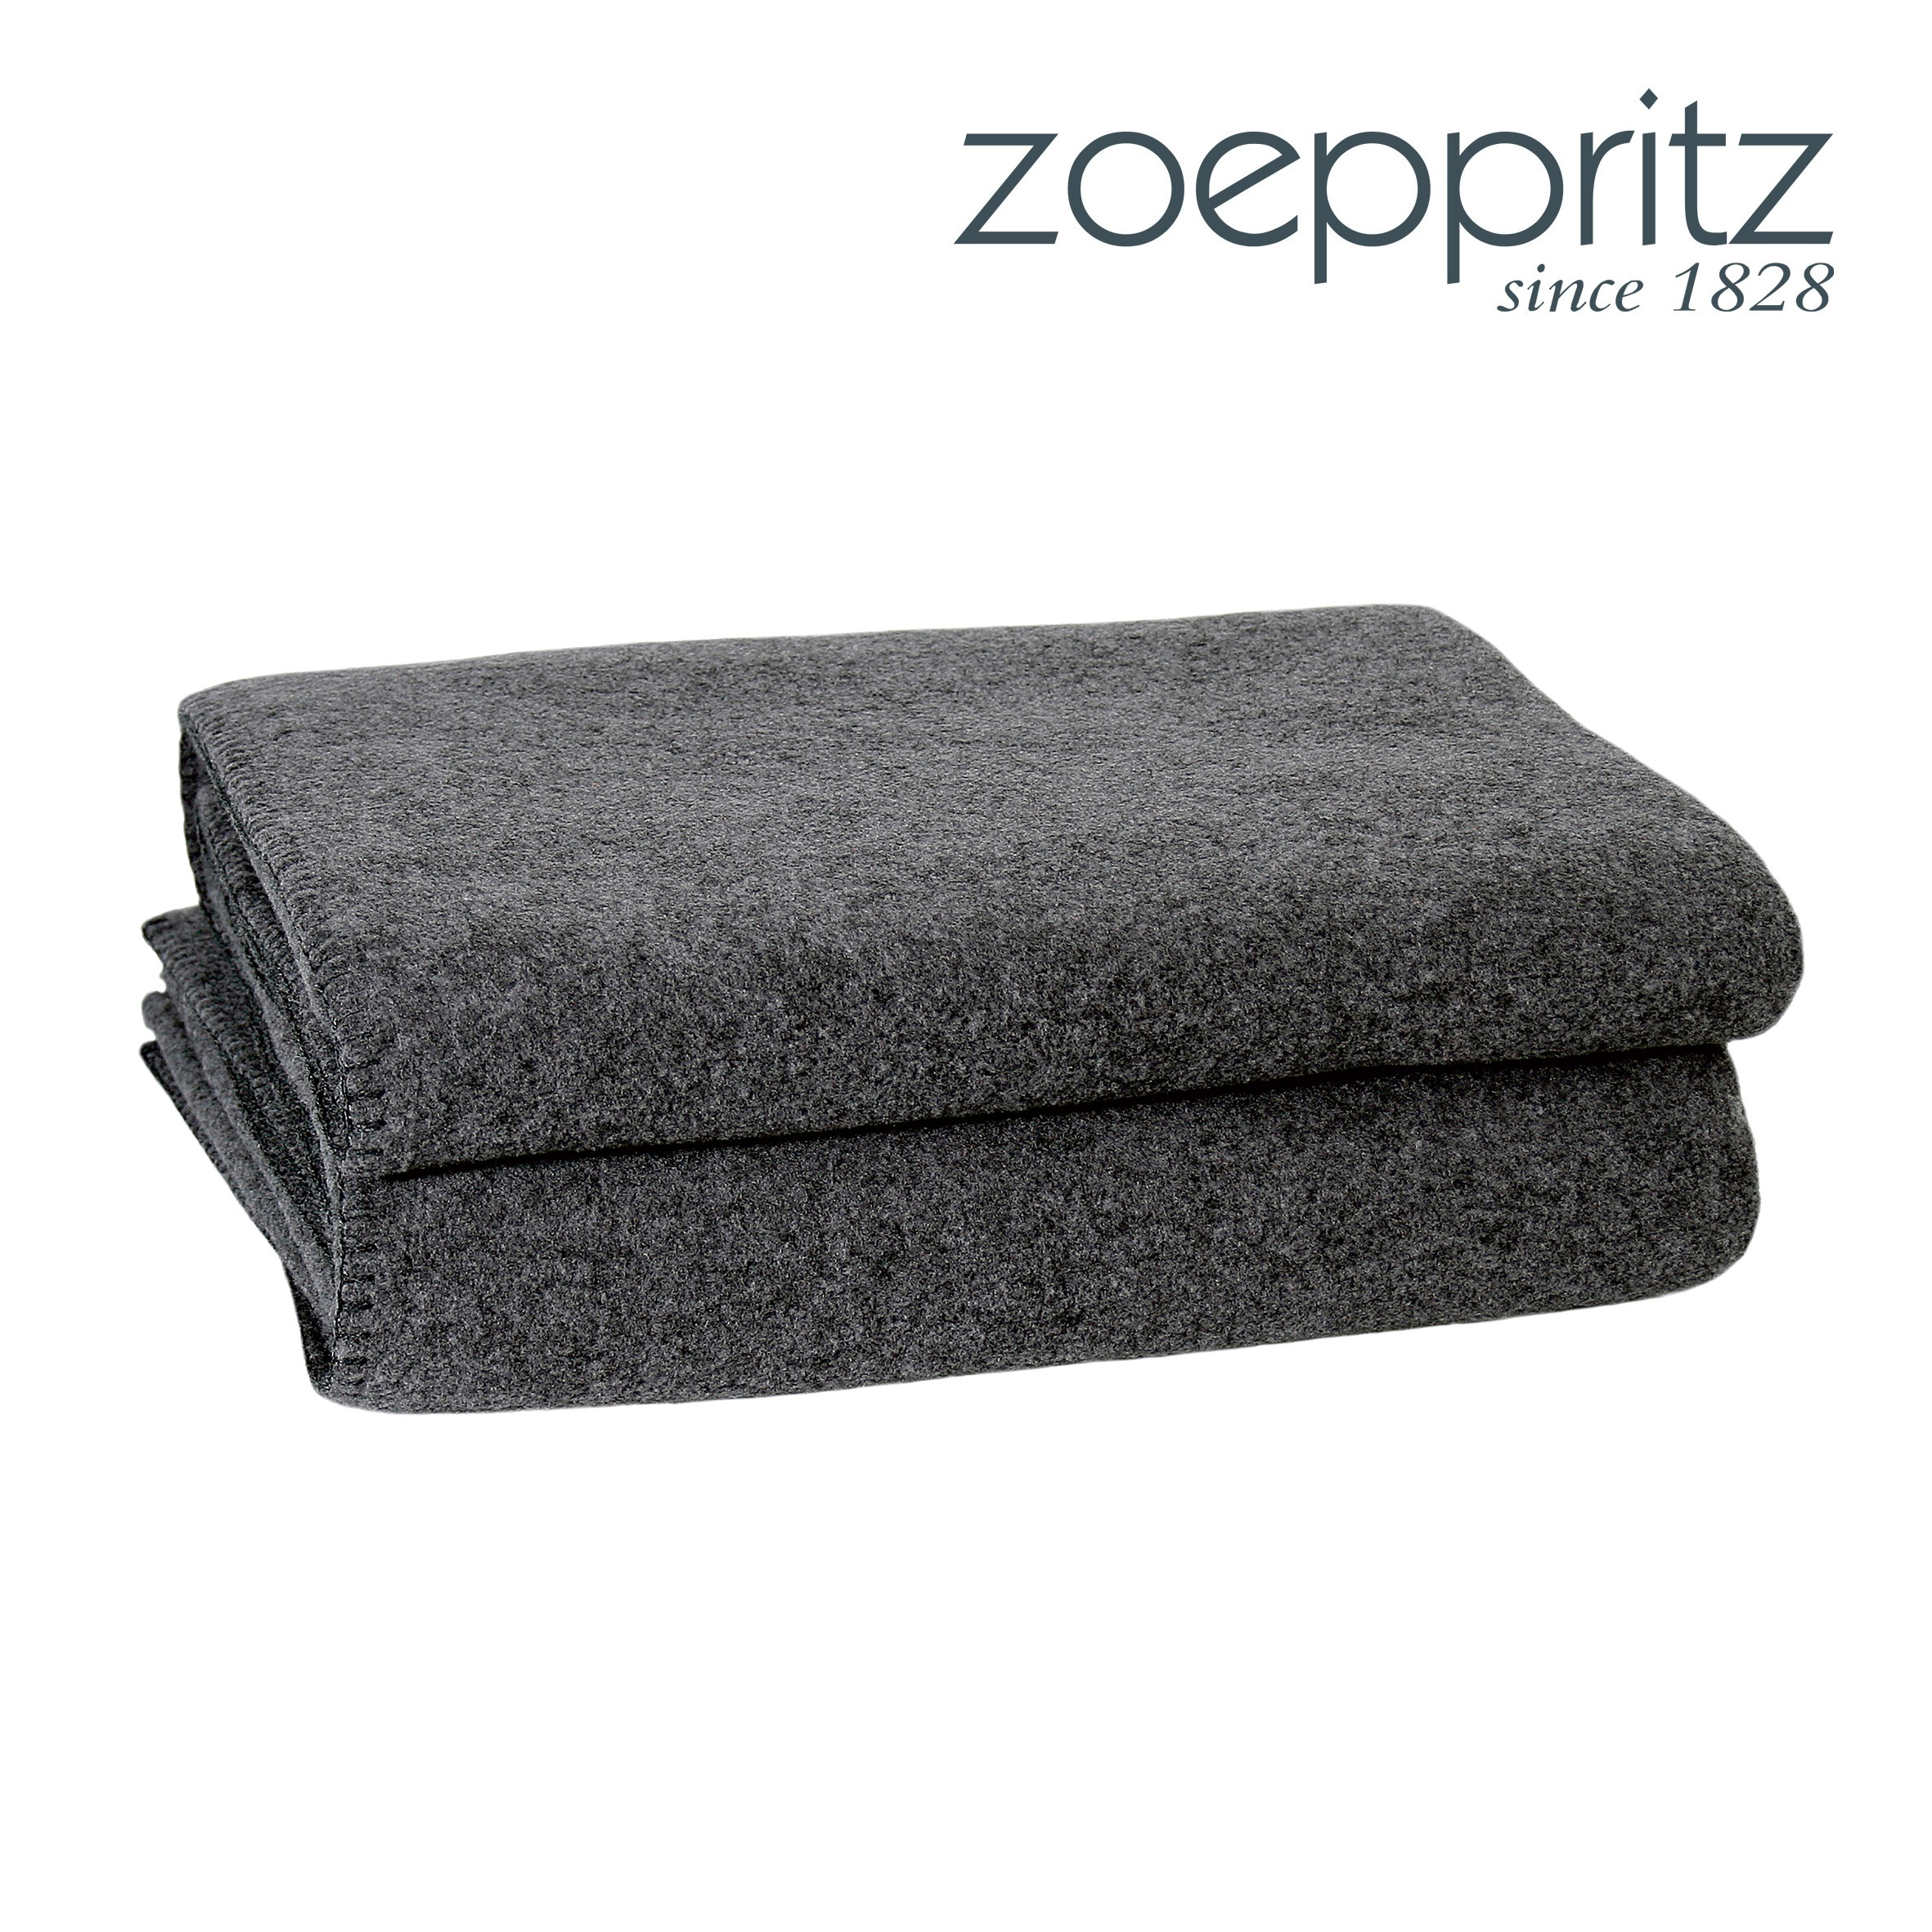 zoeppritz plaid soft wool schwarz. Black Bedroom Furniture Sets. Home Design Ideas